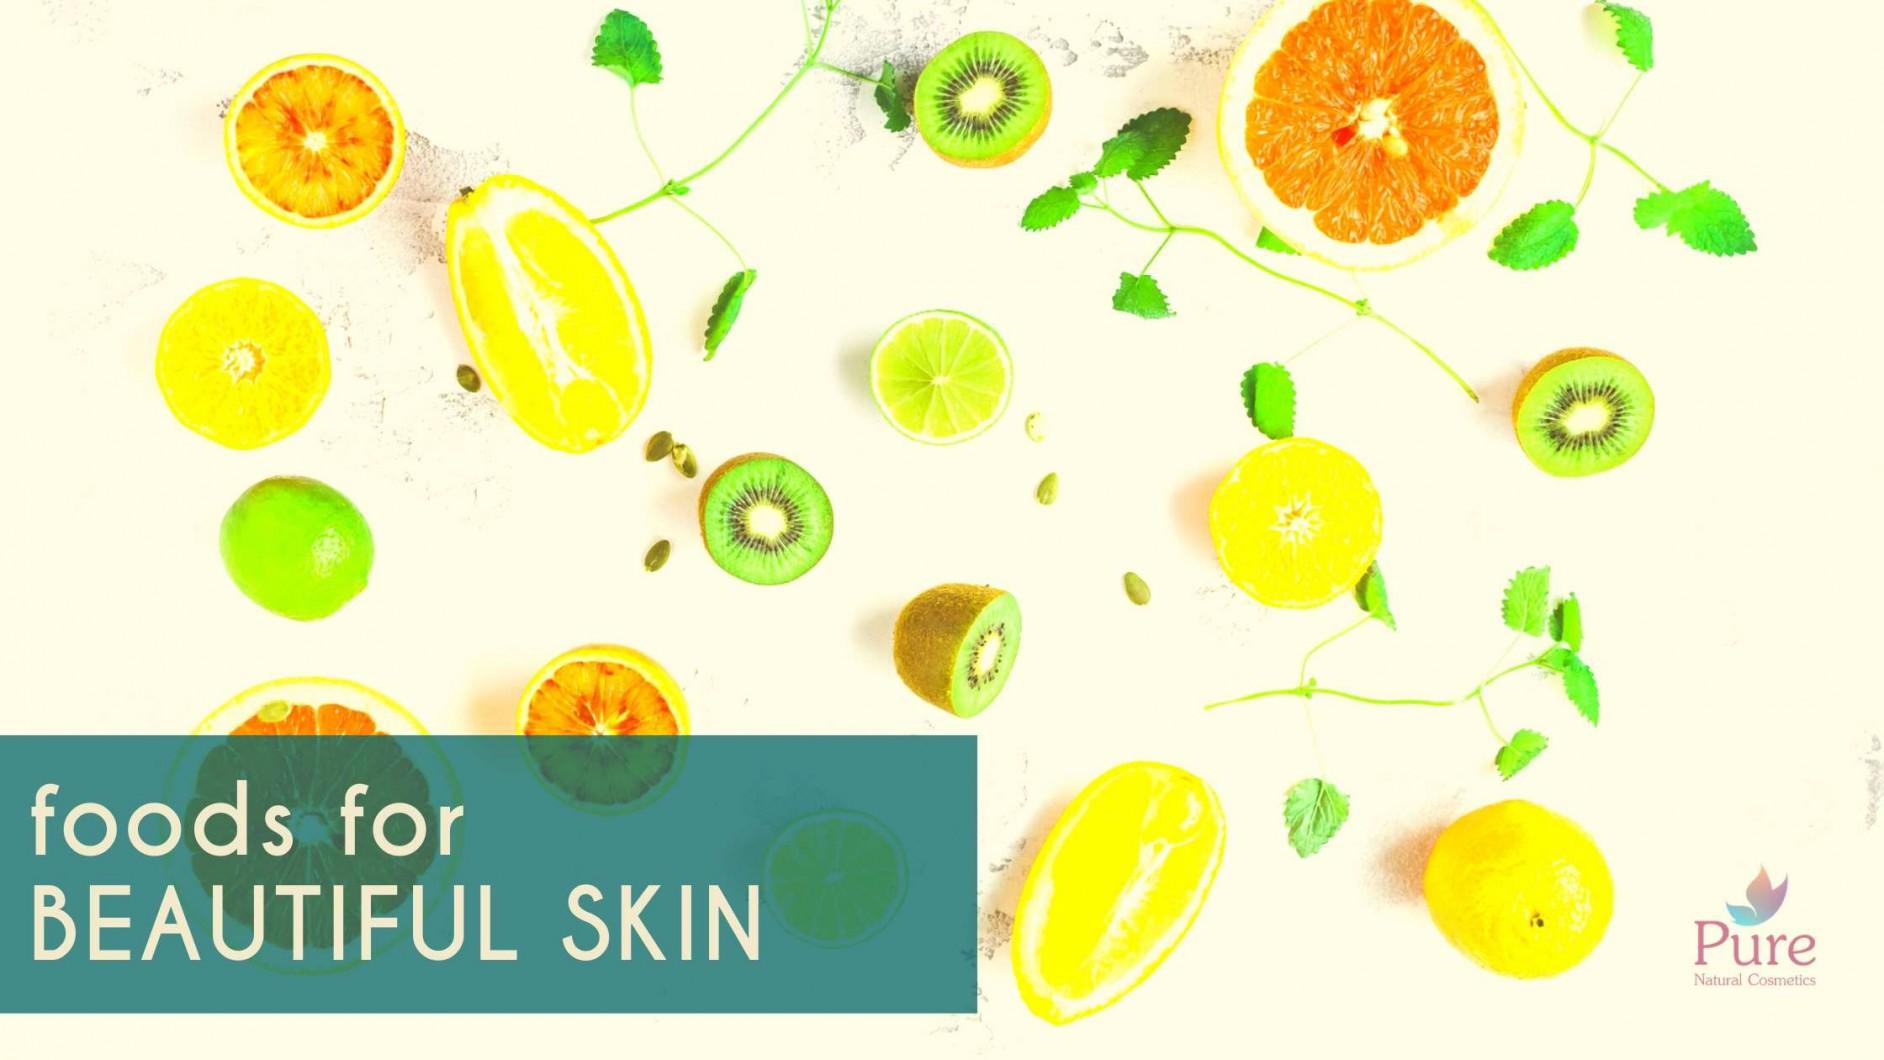 foods for beautiful skin